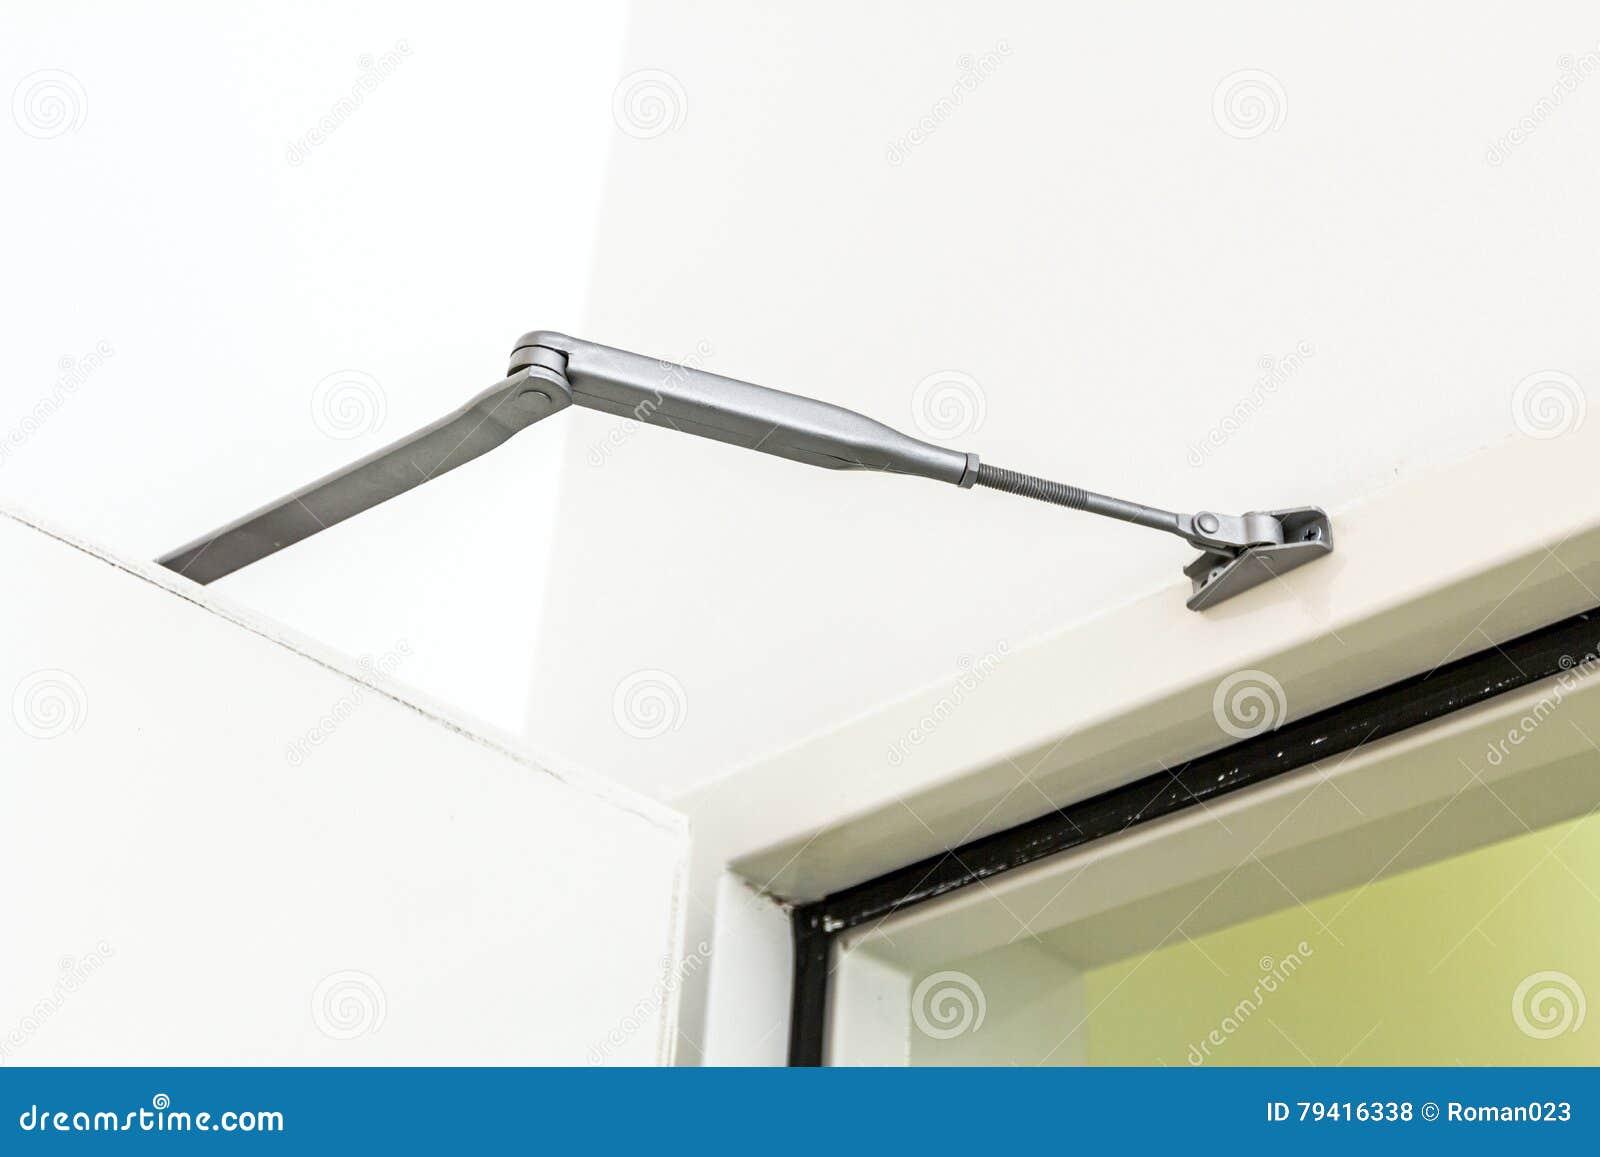 Automatic Hydraulic Leaver Hinge Door Closer Holder Stock